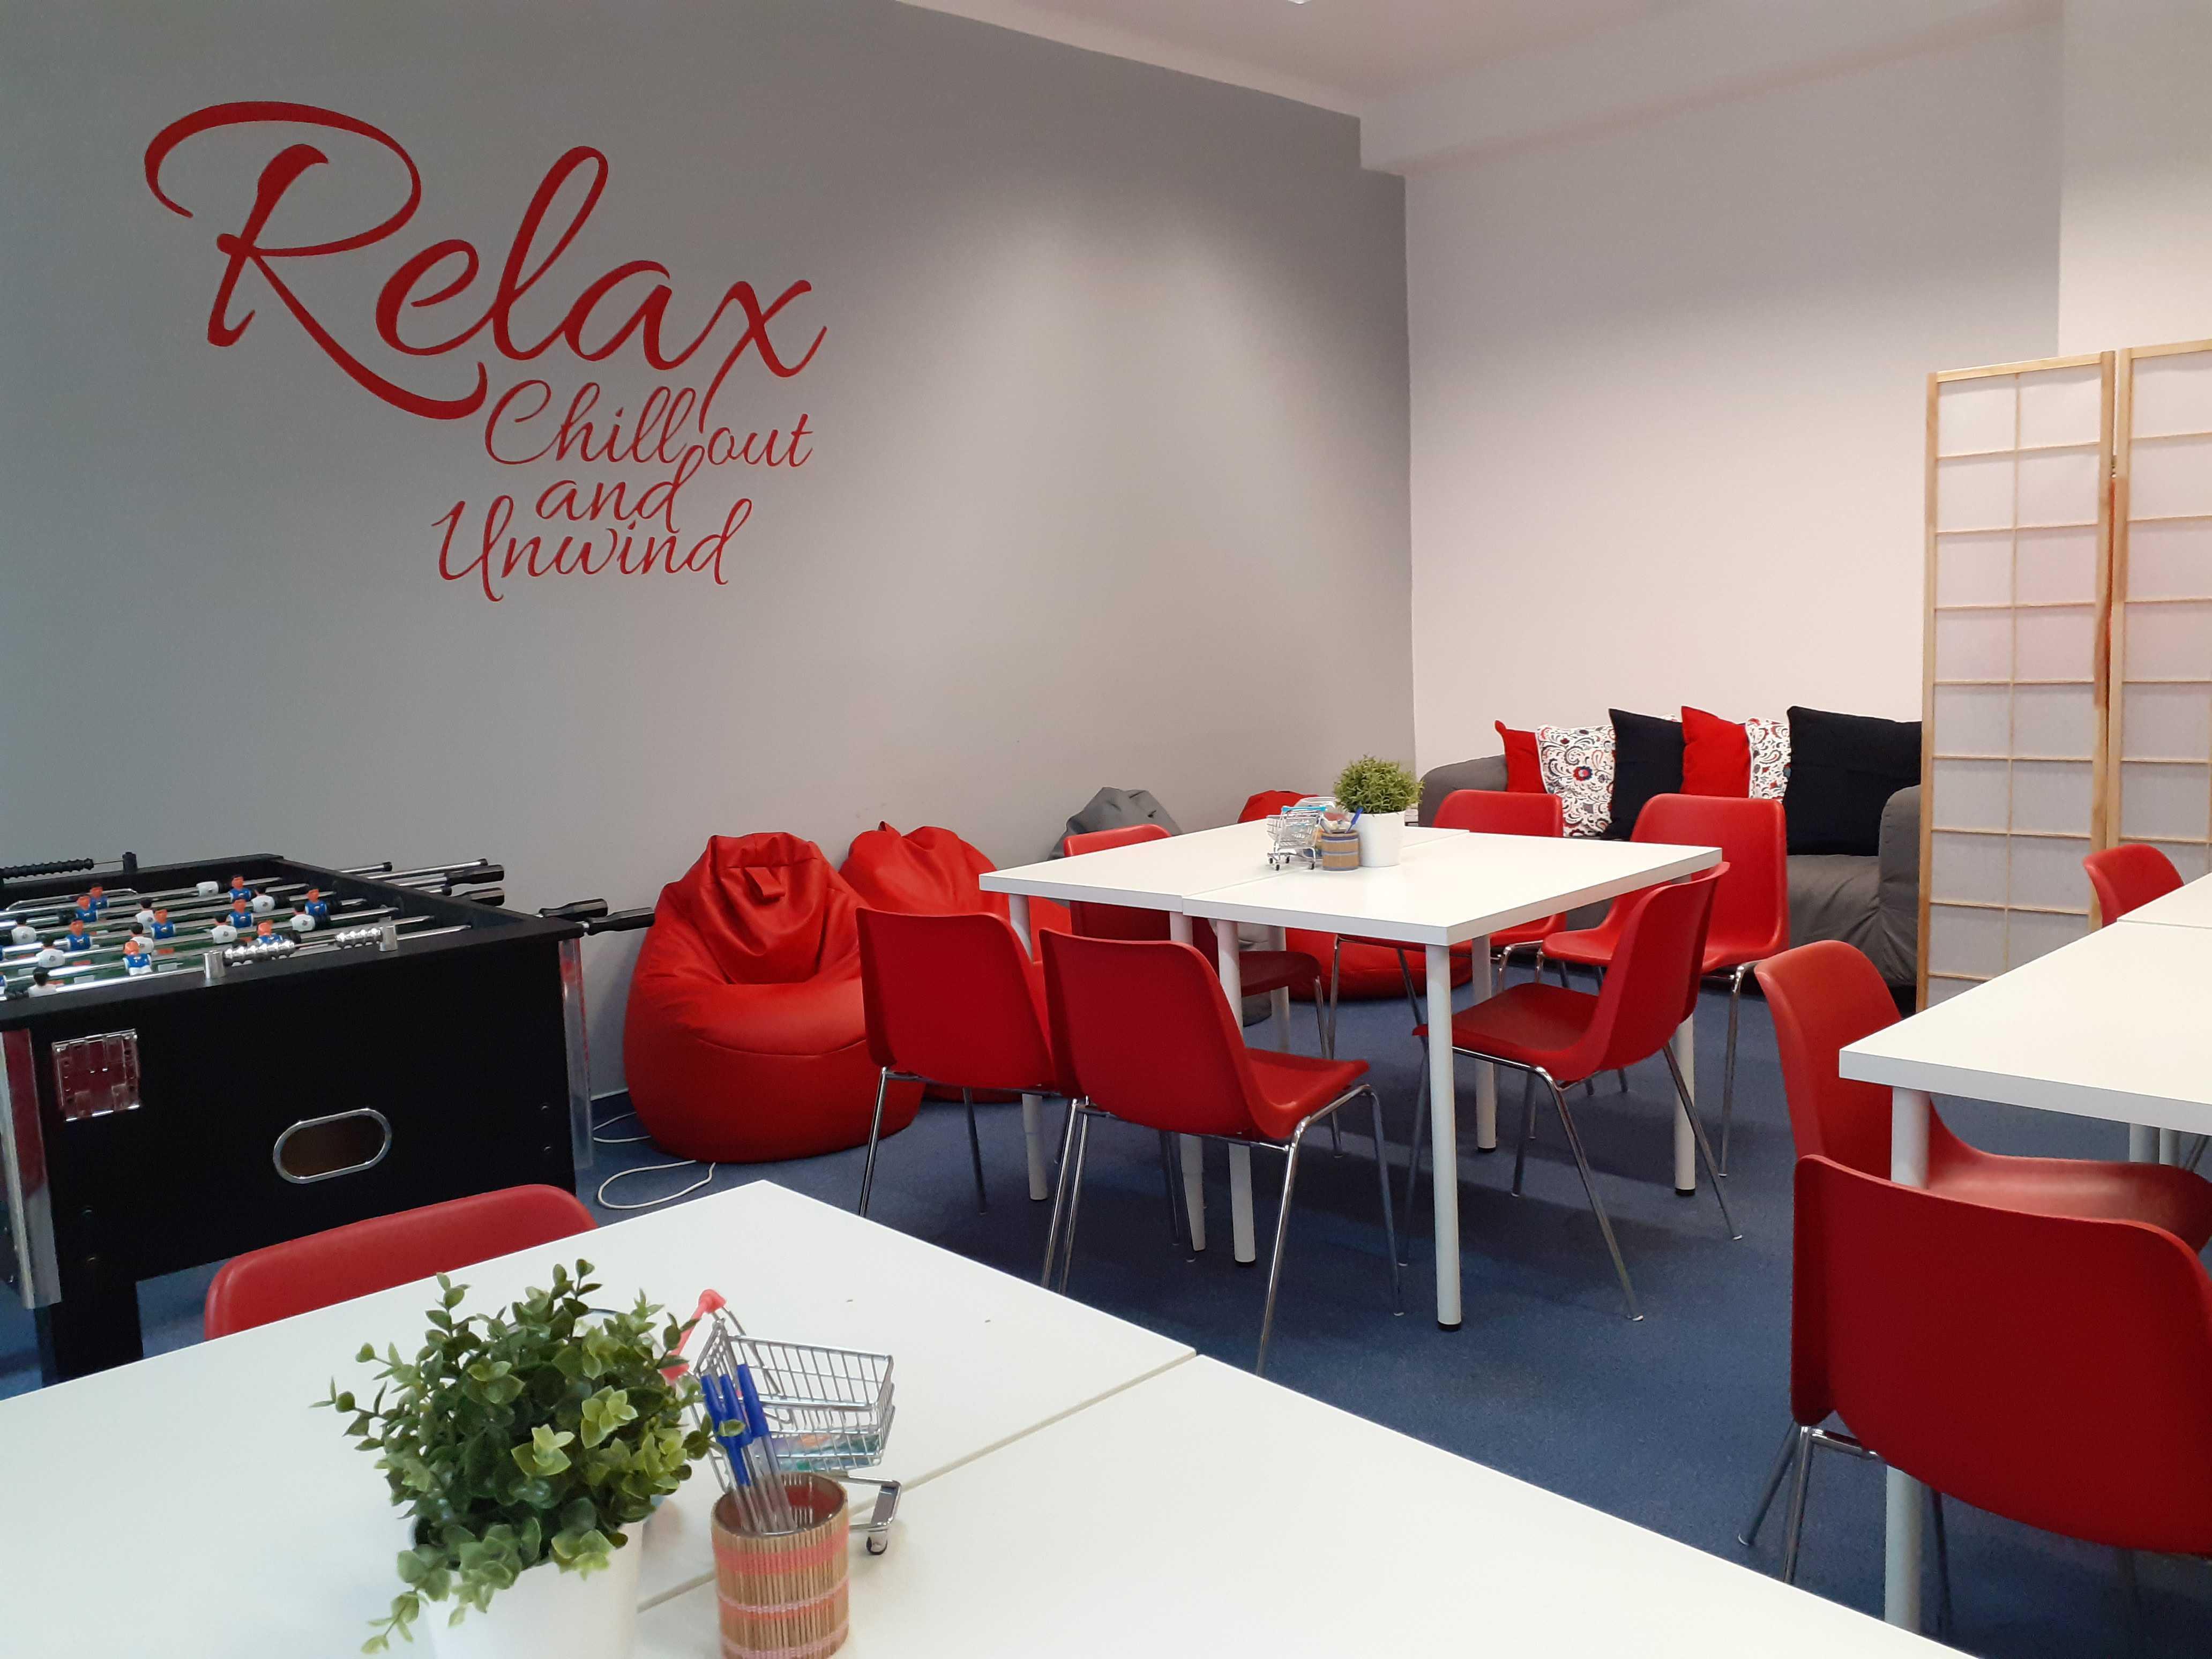 prague-startup-centre_chillout-room-1